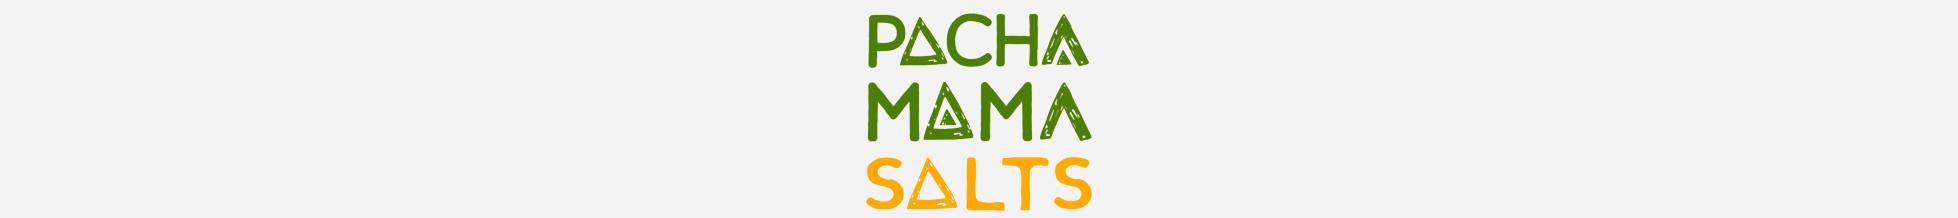 pachamama-salts.jpg